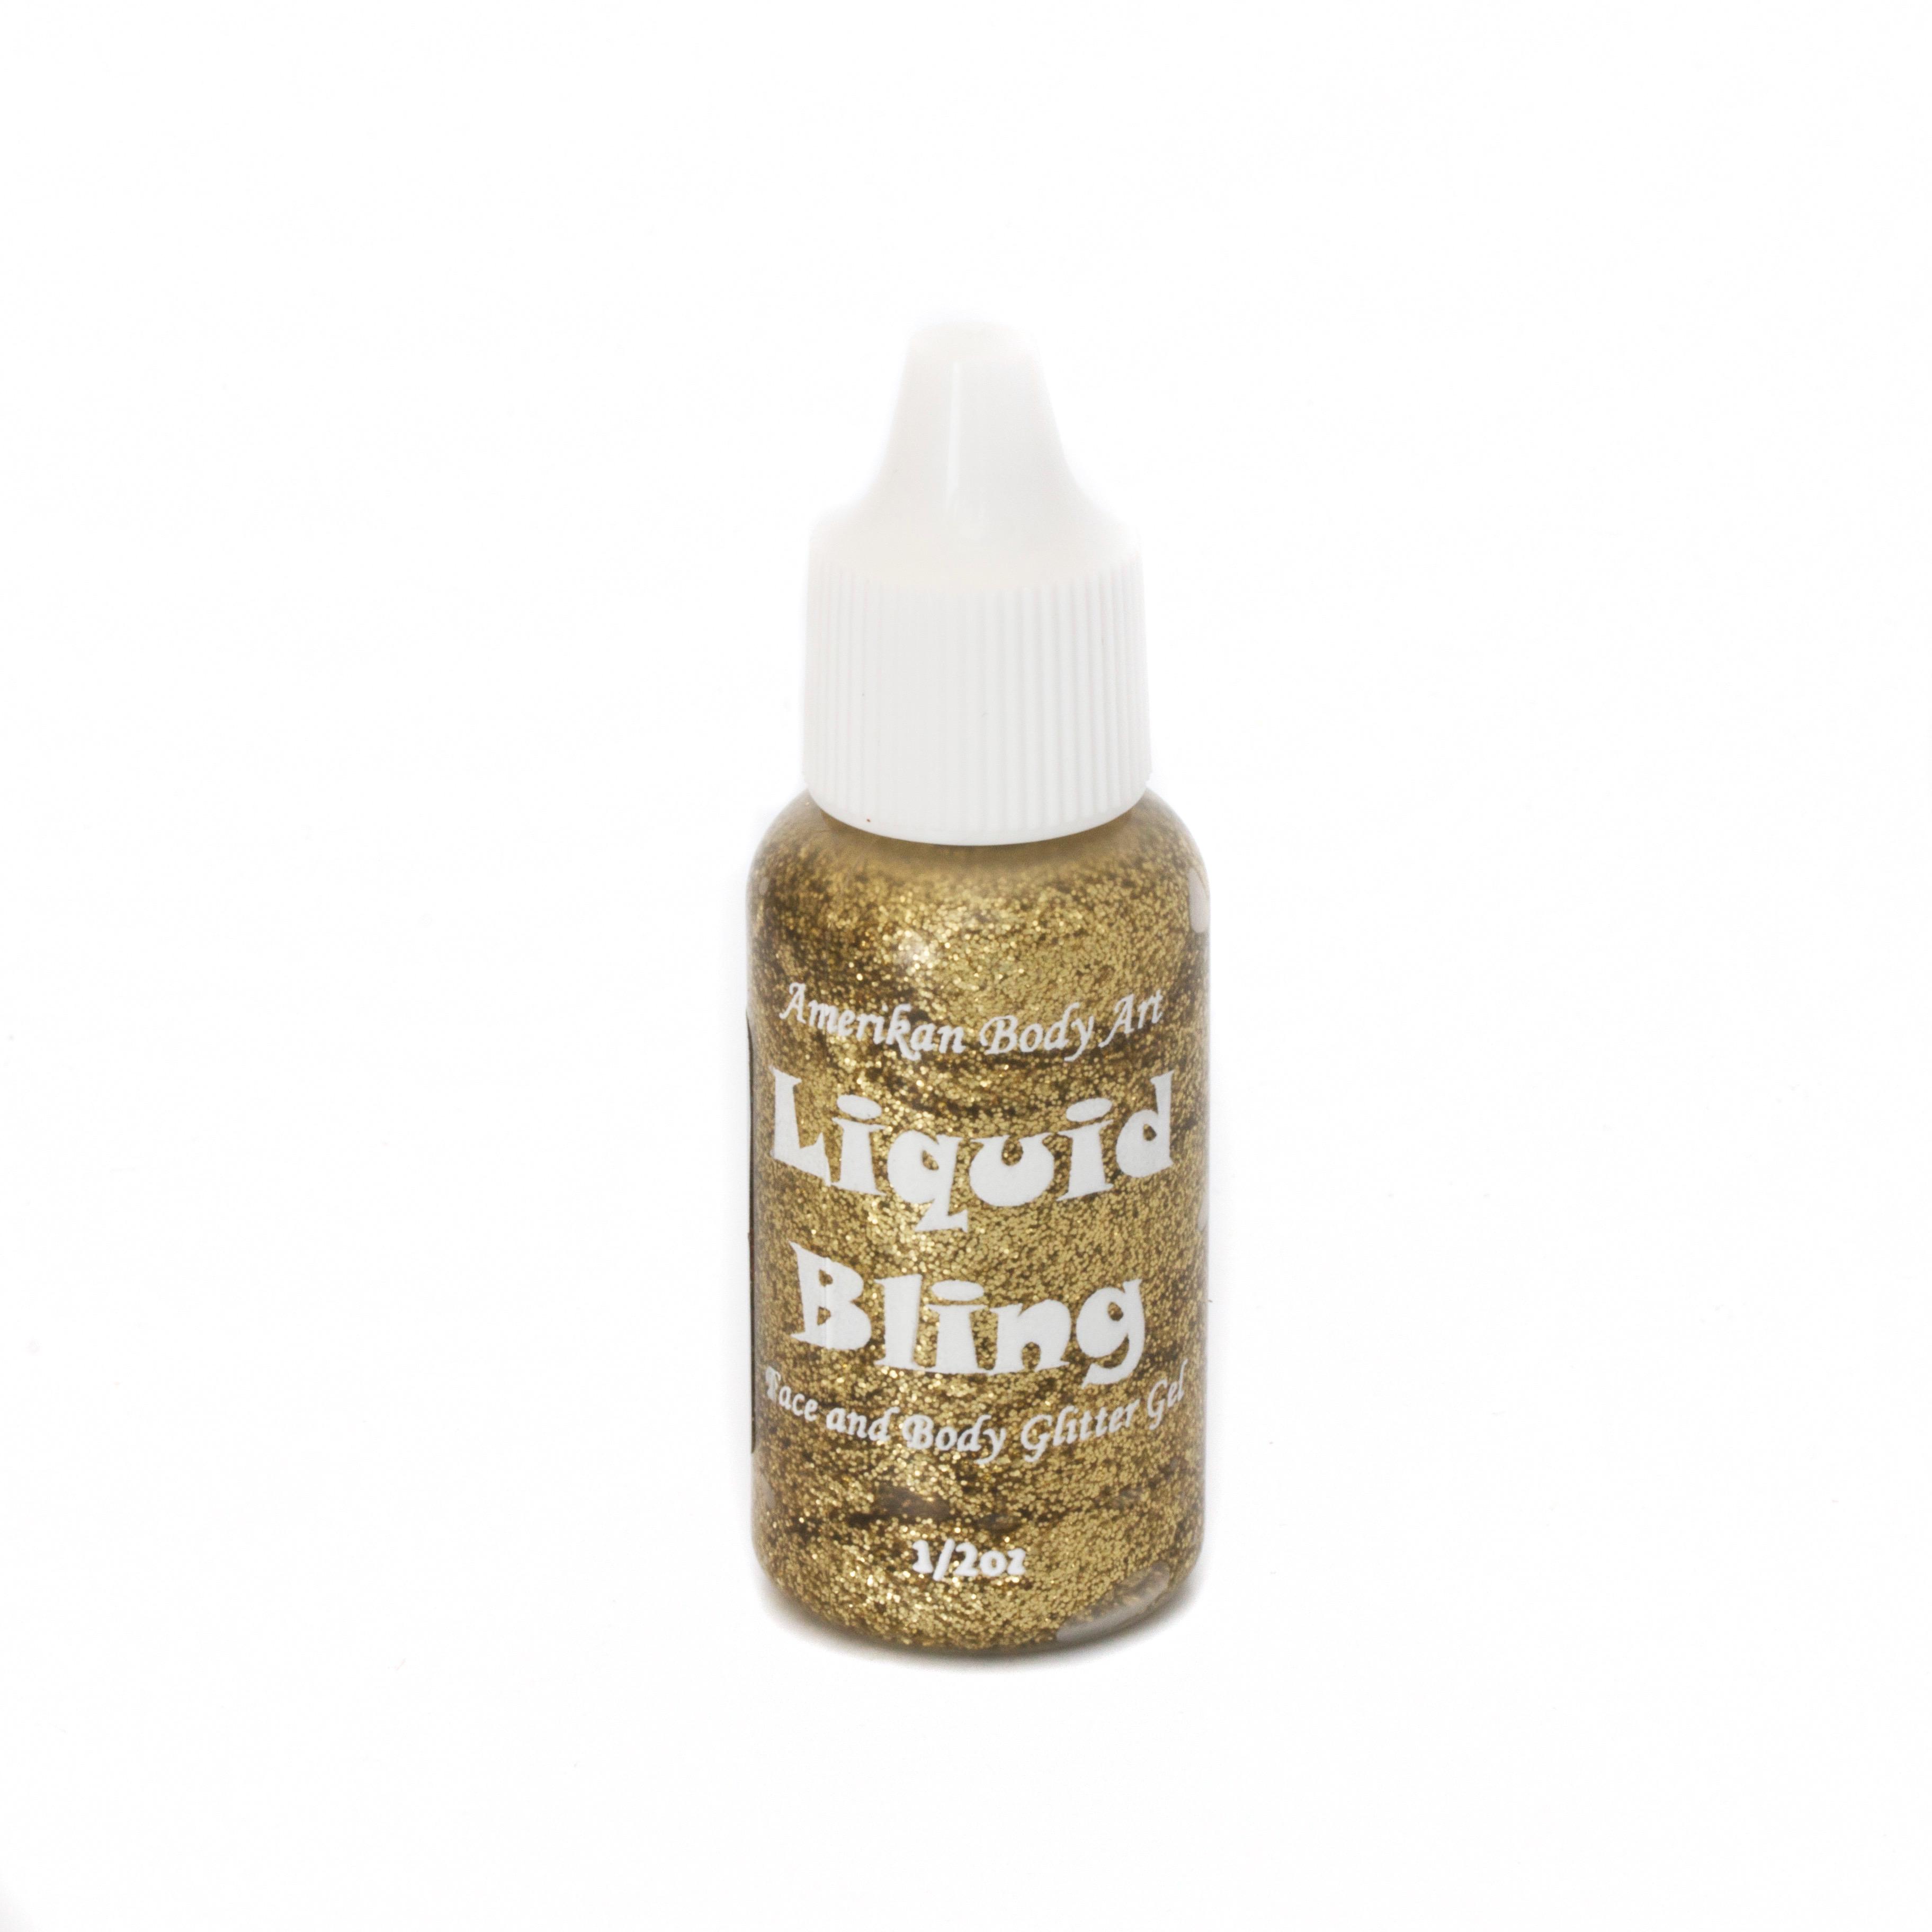 Brilliant Gold Liquid Bling 1/2oz